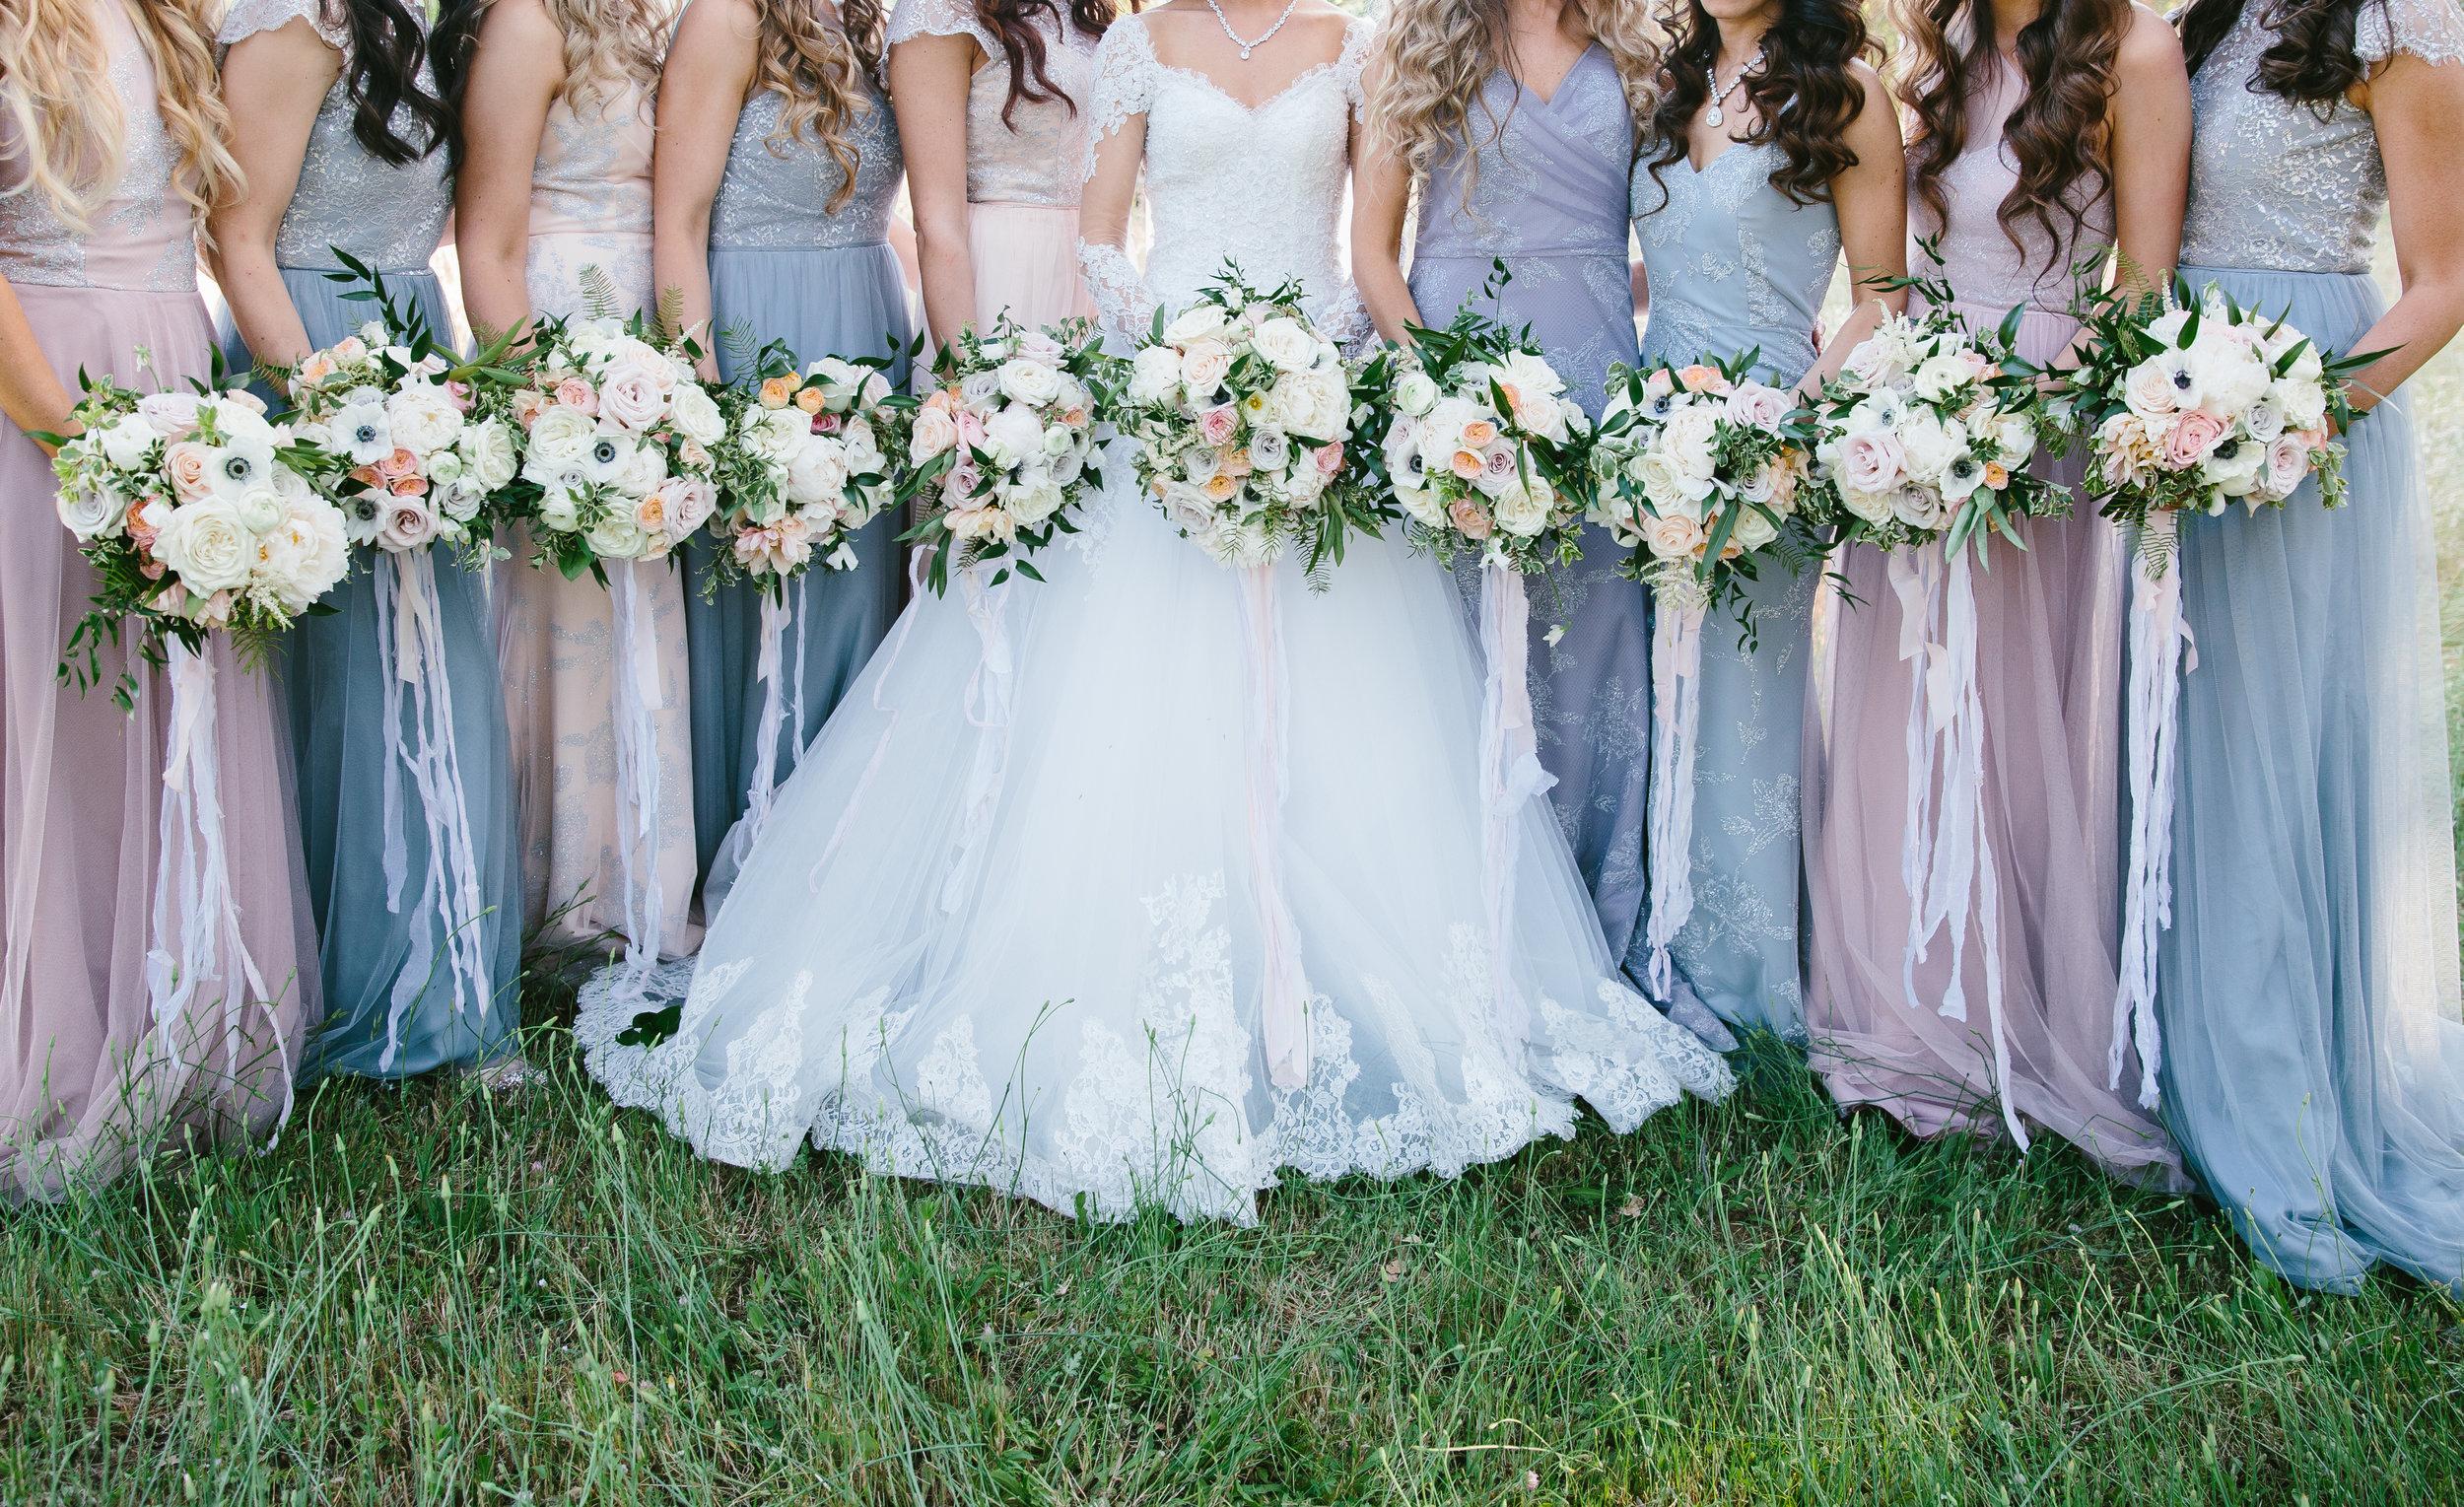 Violette-fleurs-event-design-roseville-anna-perevertaylo-rancho-robles-vinyards-Design-Installations-bride-bridesmaid-hayley-paige-bouquets-dress-accents.jpg